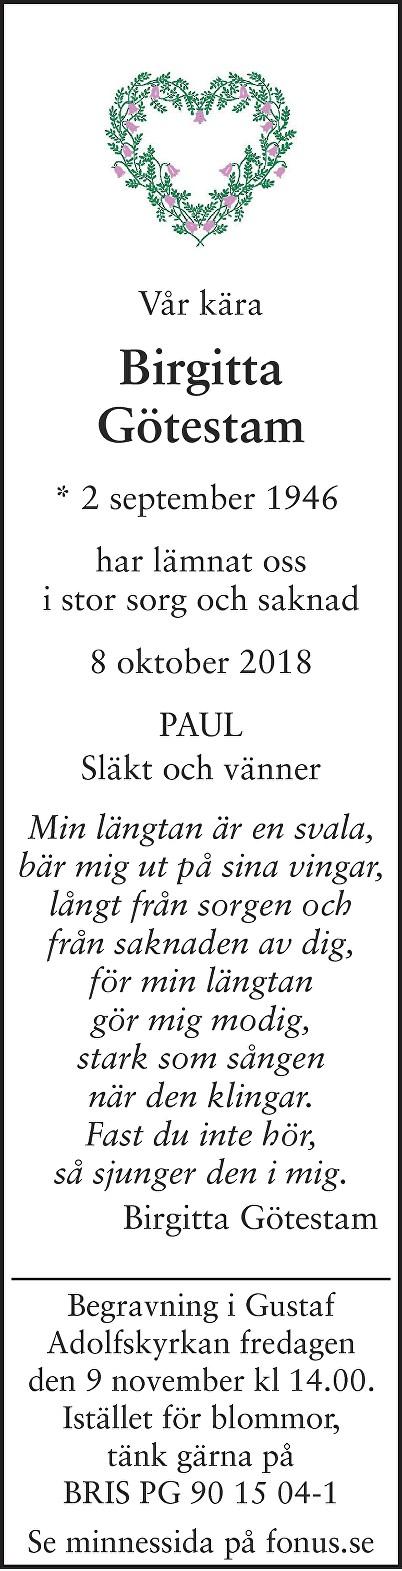 Birgitta Götestam Death notice